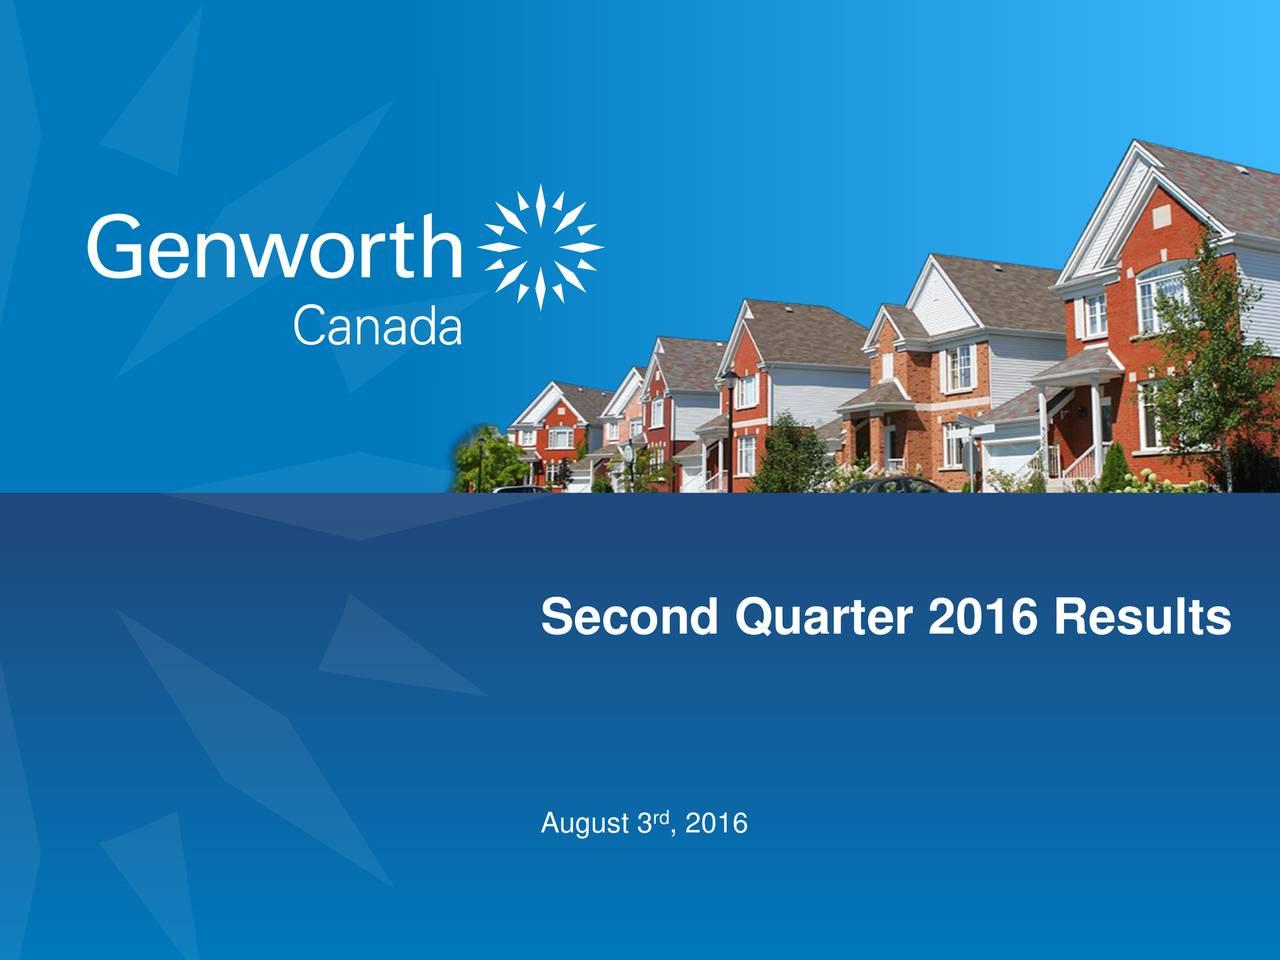 August 3 , 2016 Q2 2016 ResultGenworth MI Cana1a Inc.